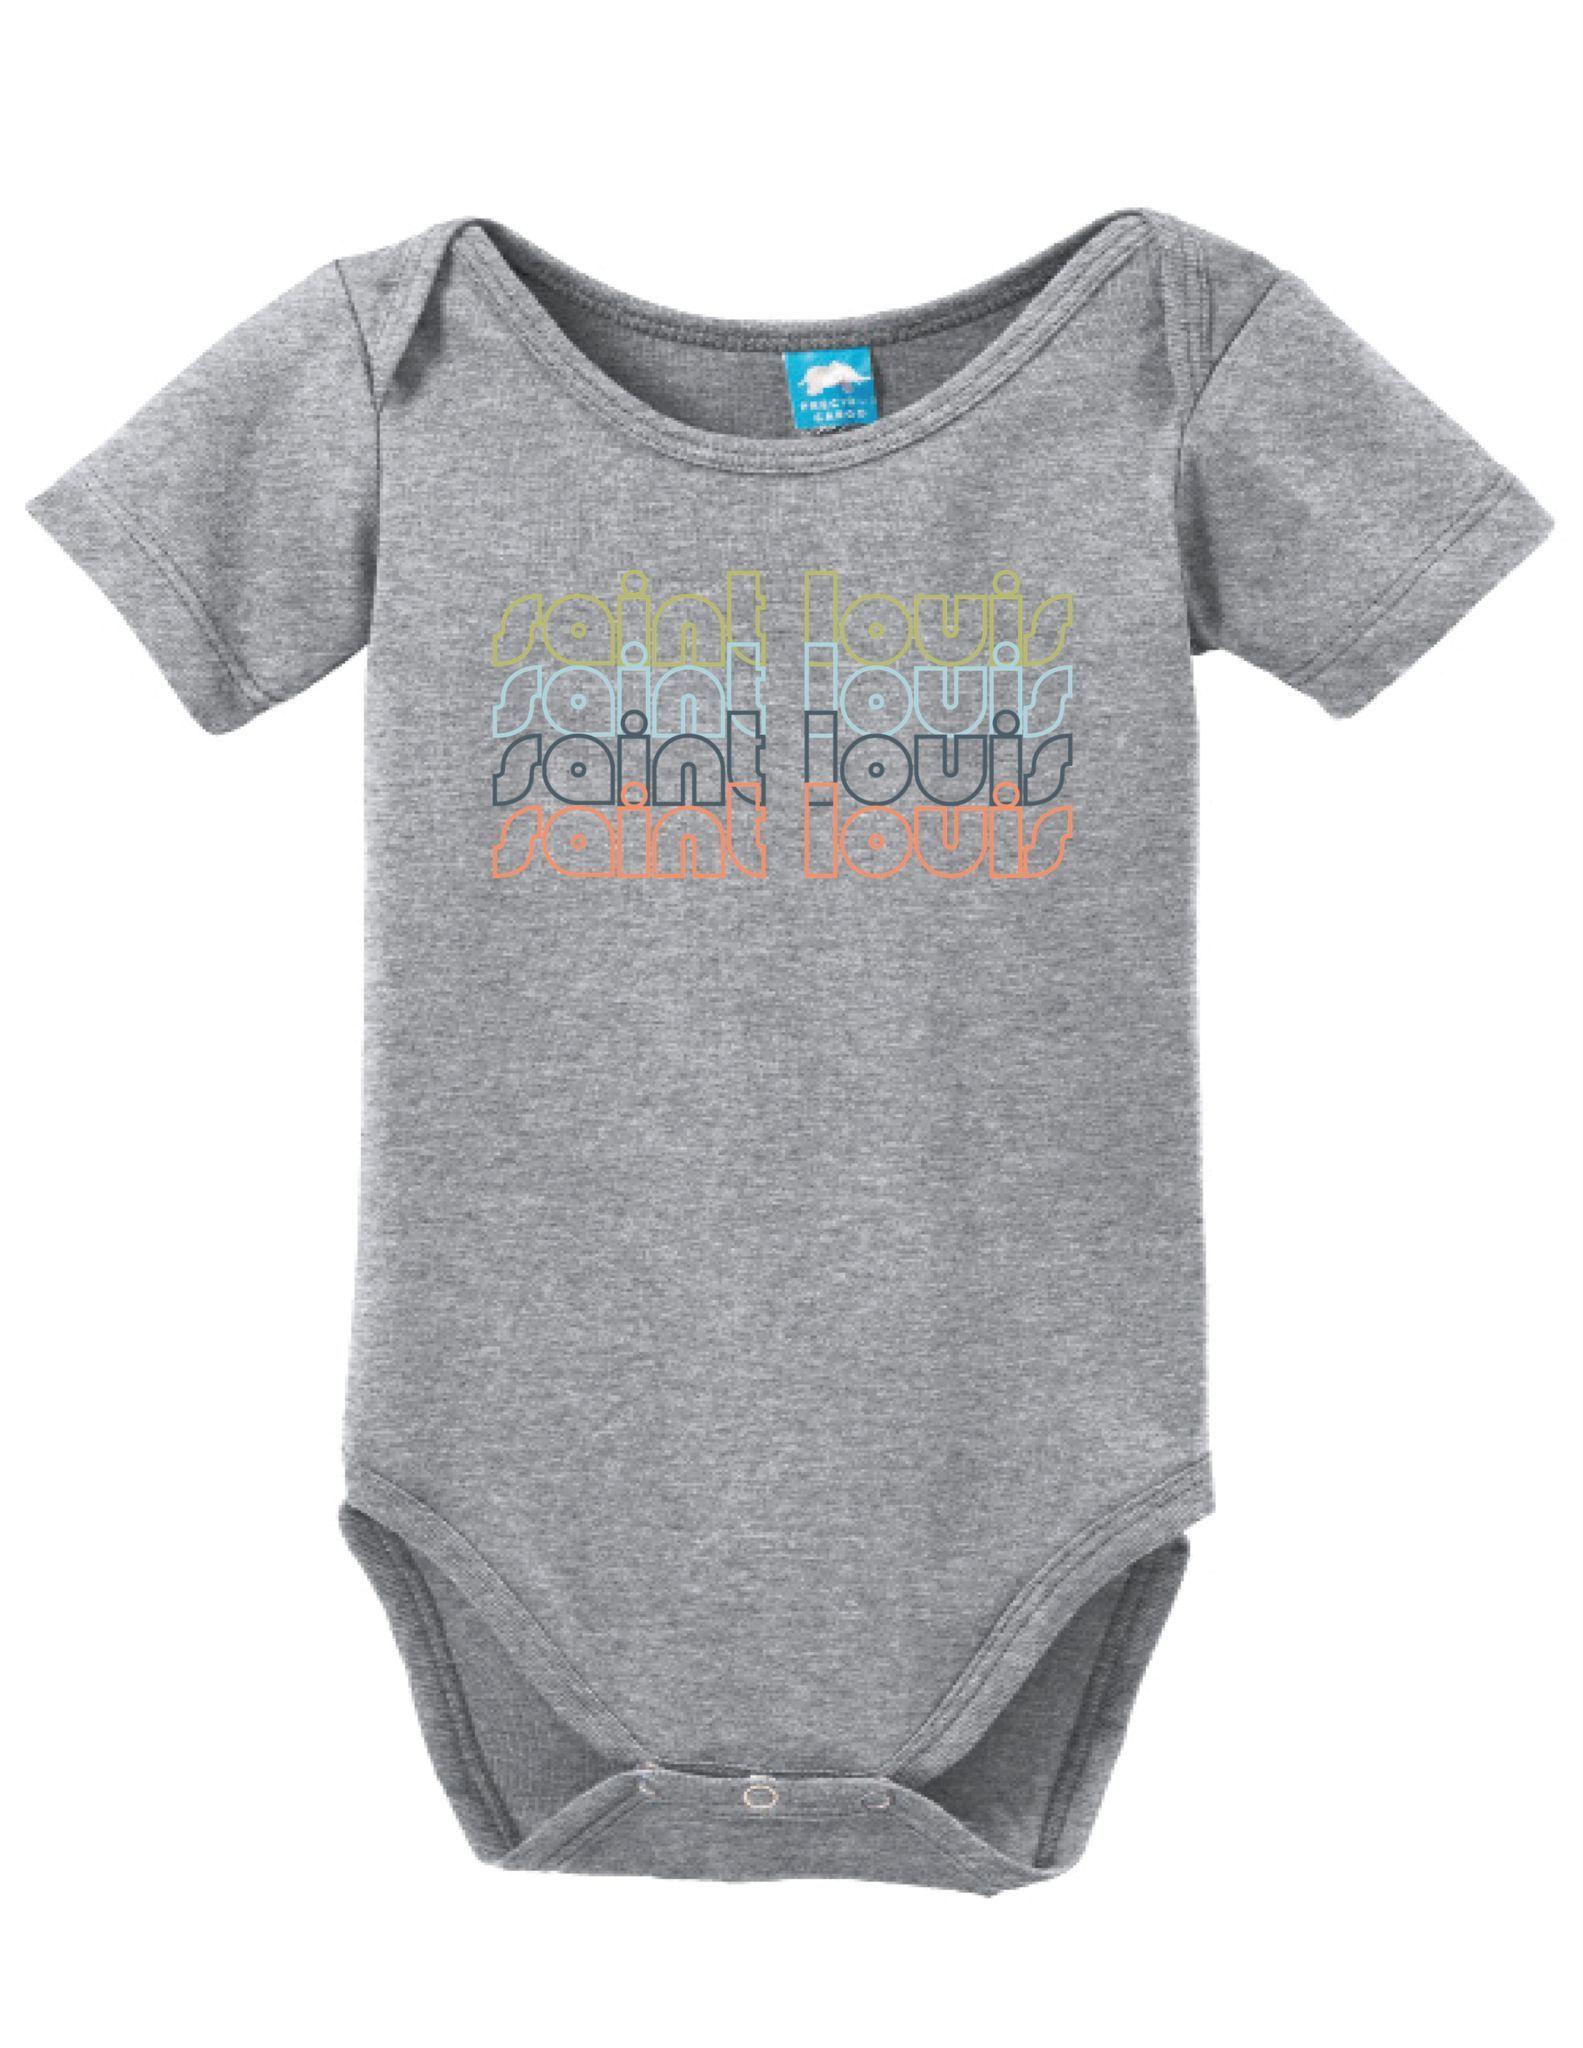 Saint Louis Missouri Retro Onesie Funny Bodysuit Baby Romper